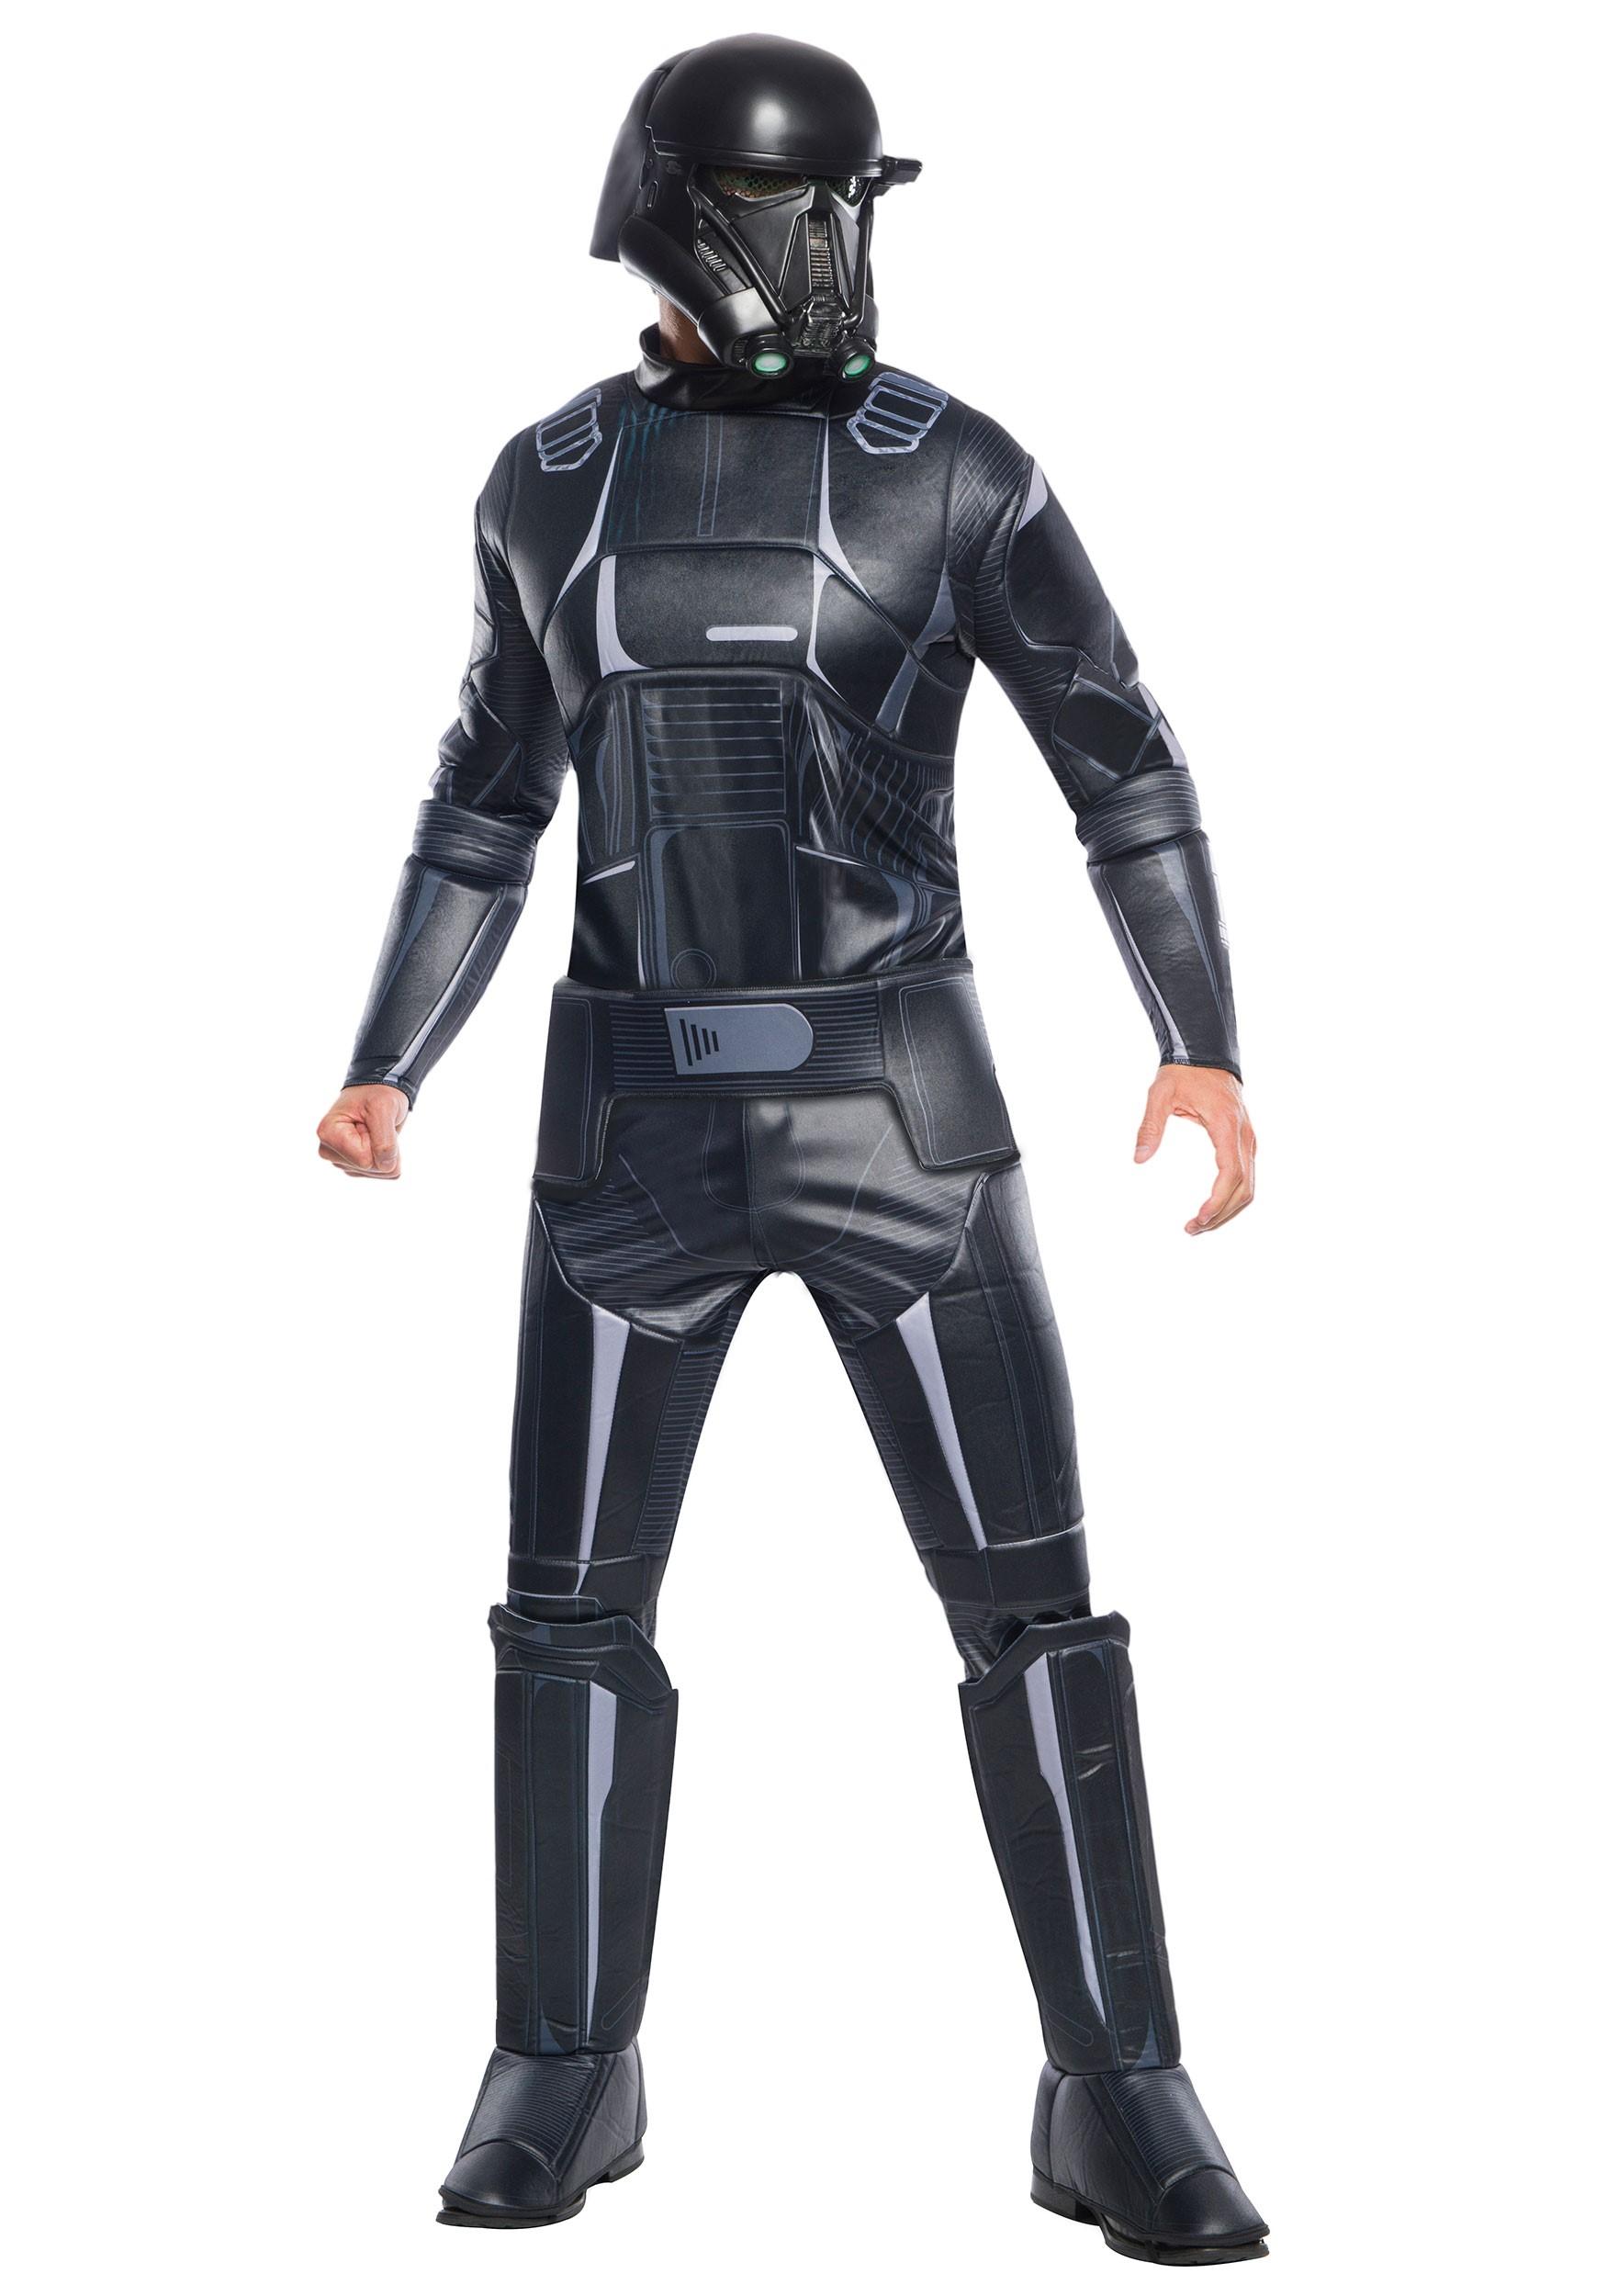 Super Deluxe Death Trooper Costume For kids